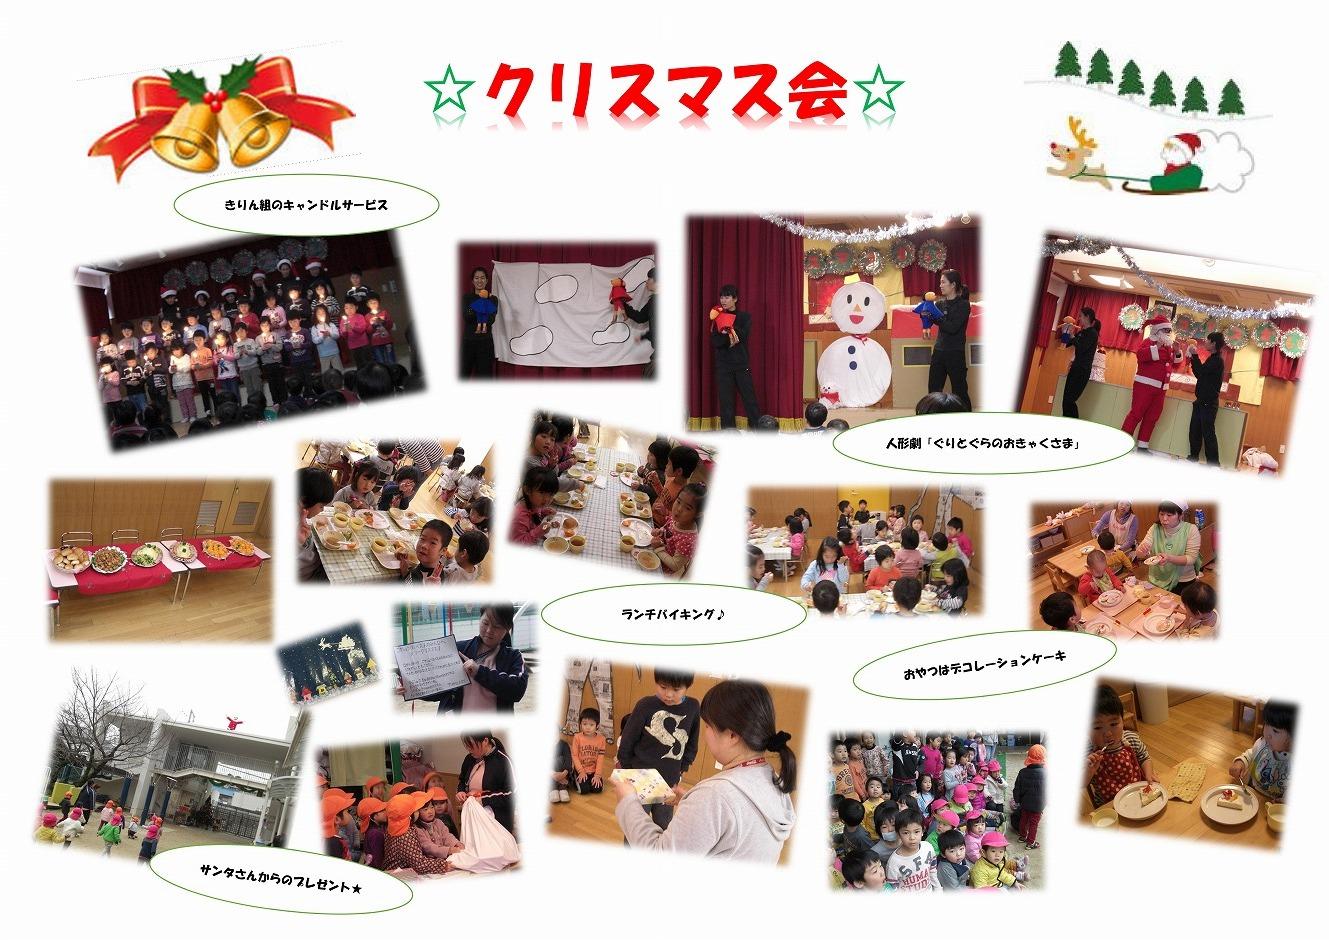 Microsoft Word - クリスマス会